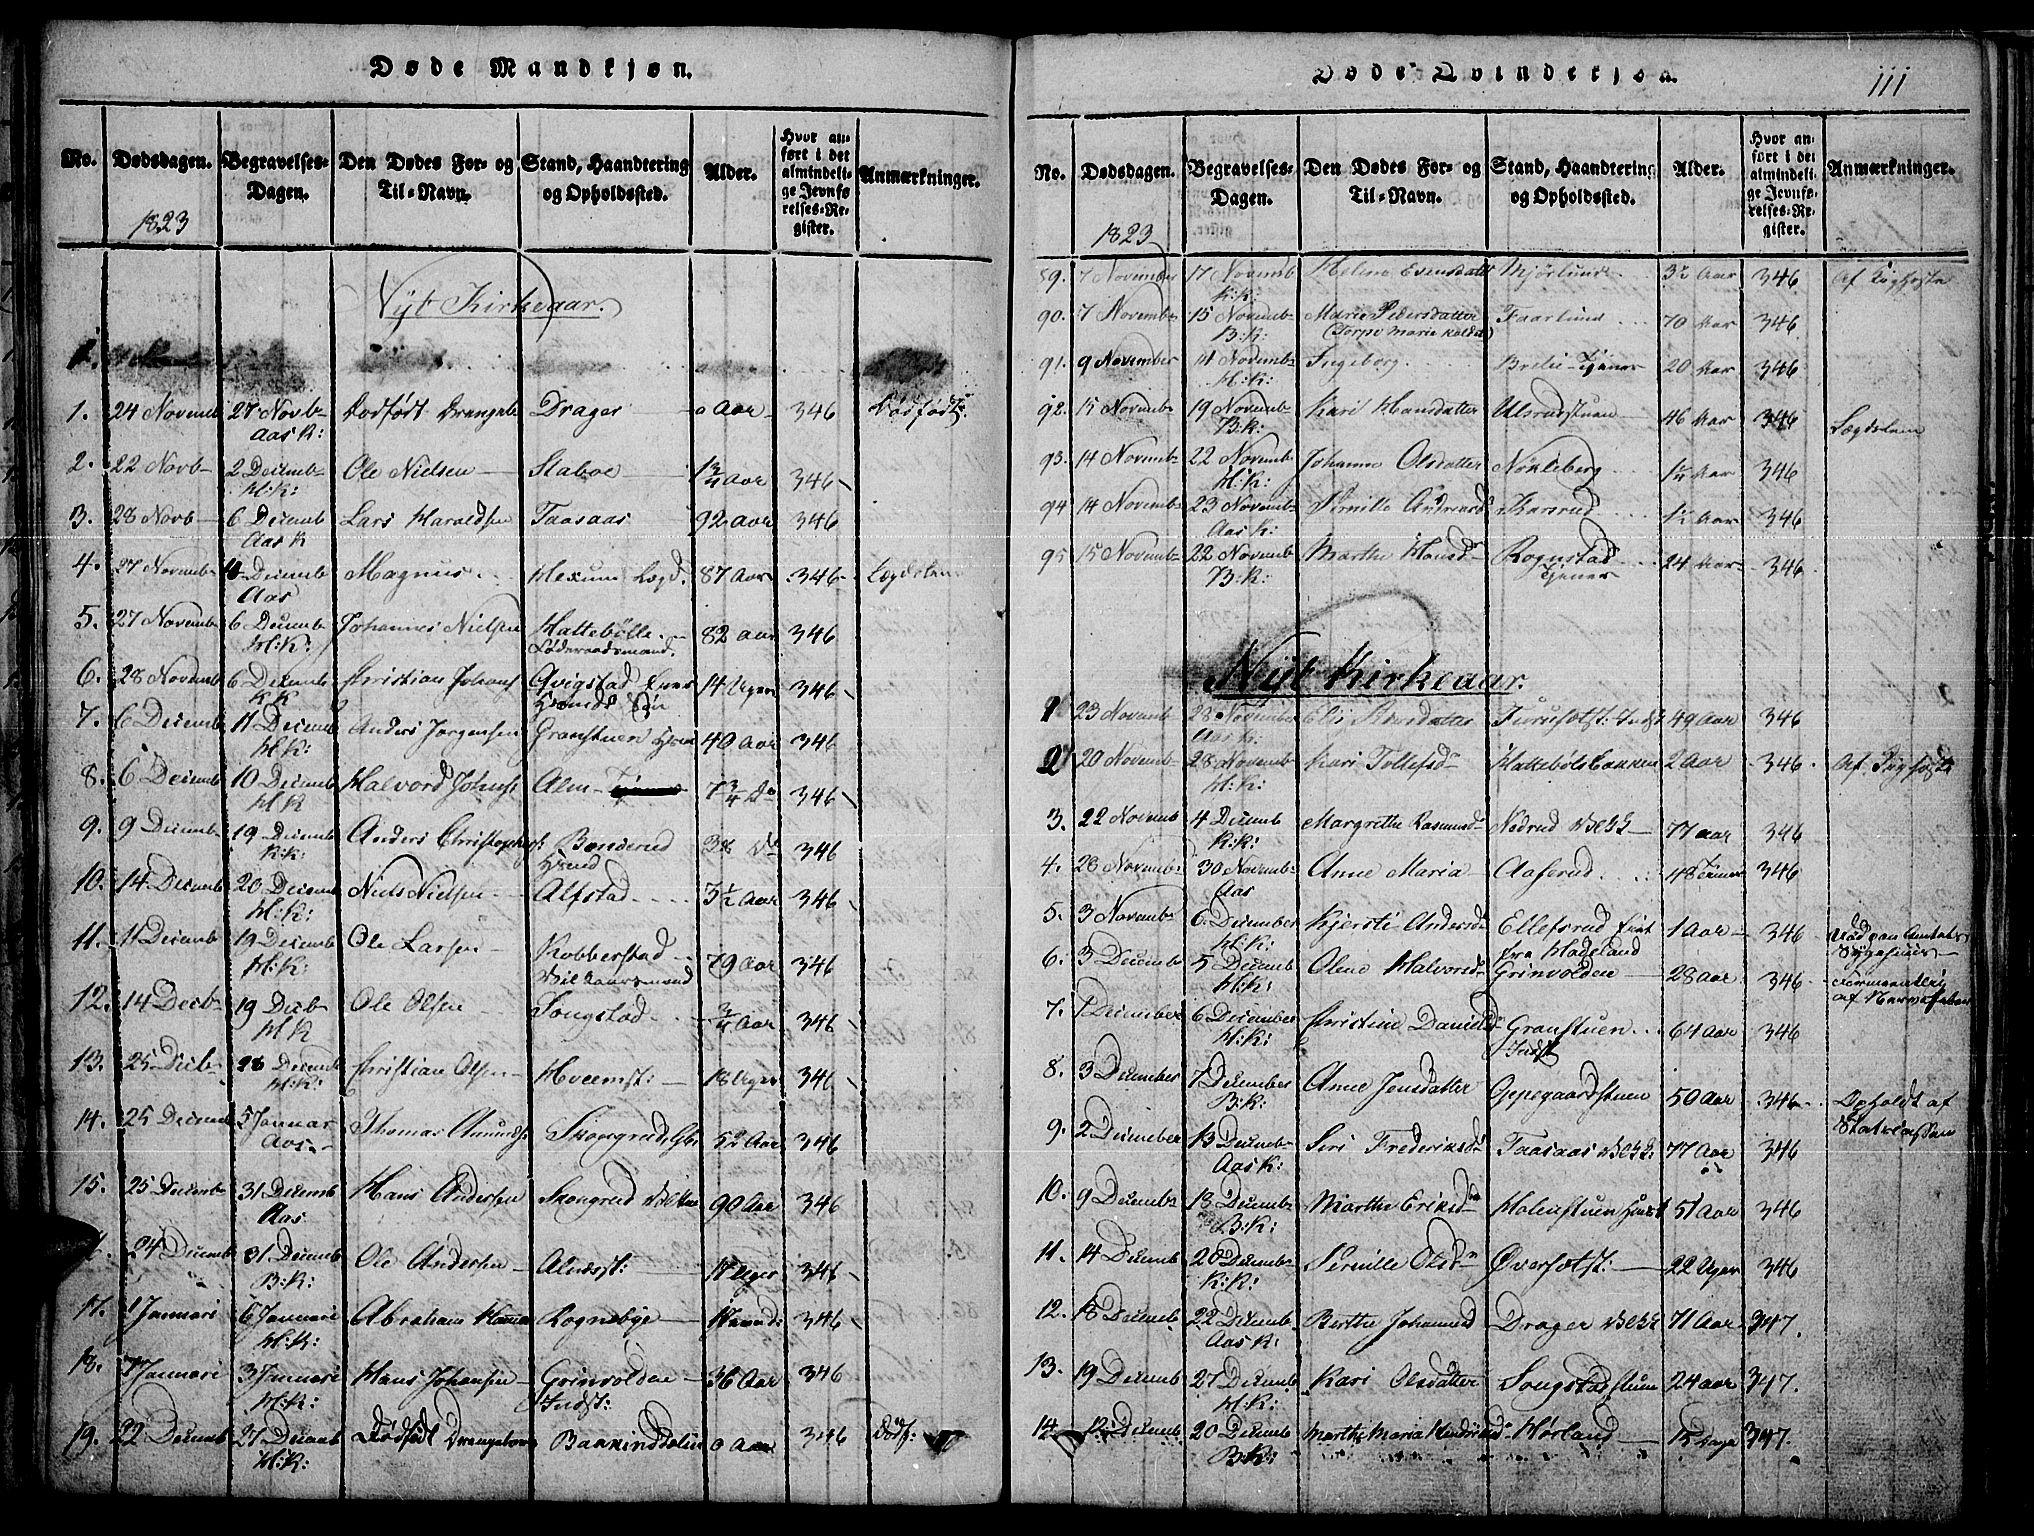 SAH, Toten prestekontor, Ministerialbok nr. 10, 1820-1828, s. 111